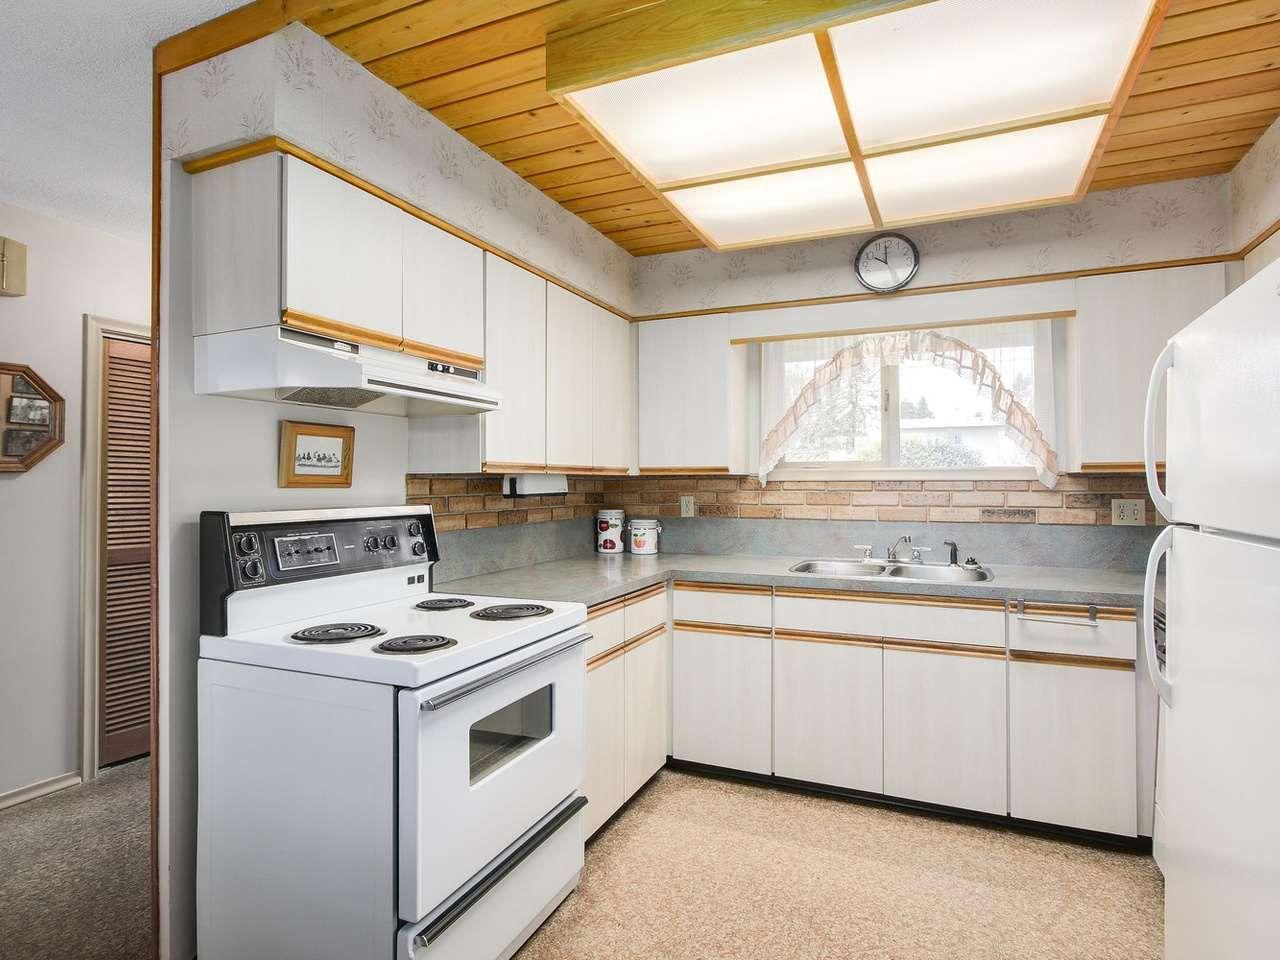 Photo 8: Photos: 1320 REGAN Avenue in Coquitlam: Central Coquitlam House for sale : MLS®# R2147096